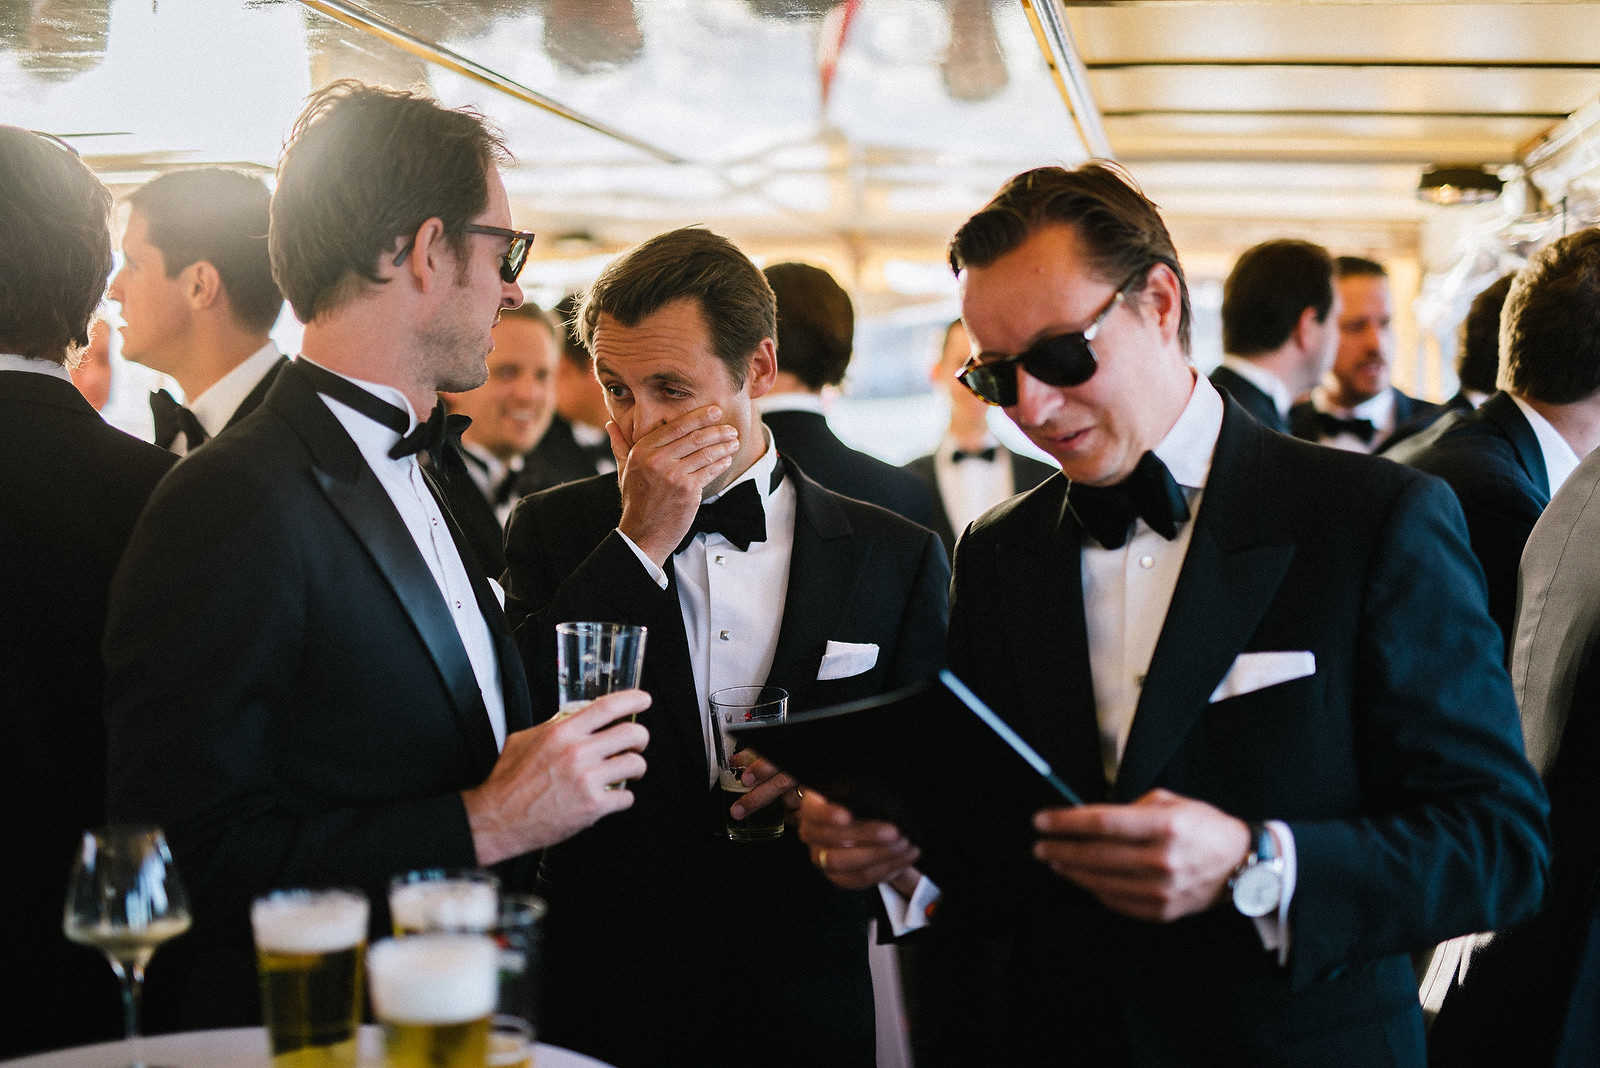 Fotograf Konstanz - Destination Wedding Photographer Amsterdam 100 - Destination Wedding Amsterdam  - 204 -